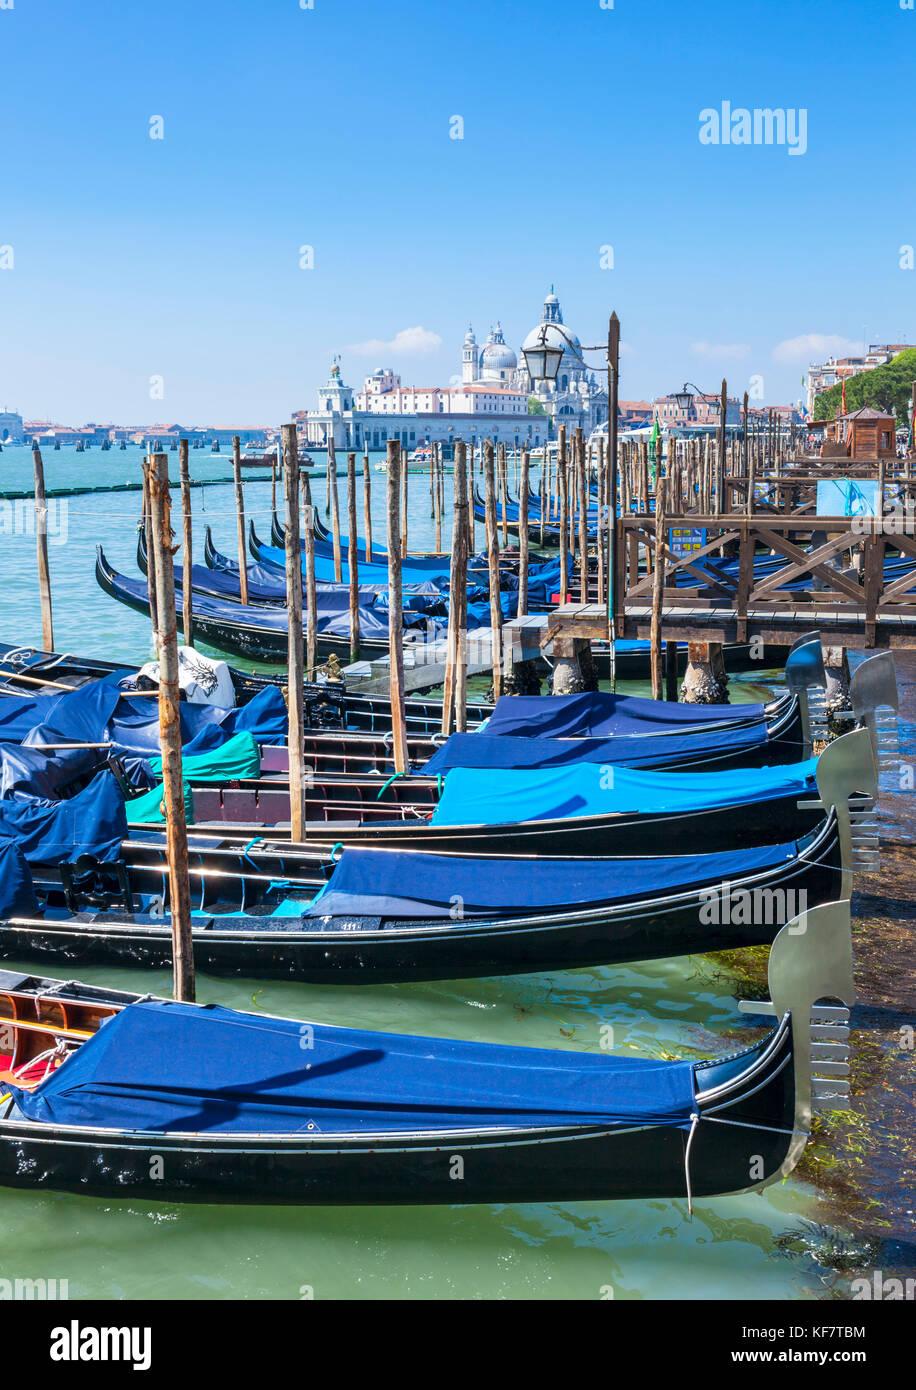 Italy venice italy moored gondolas on the Grand Canal Venice Riva degli Schiavoni Venice italy eu europe - Stock Image